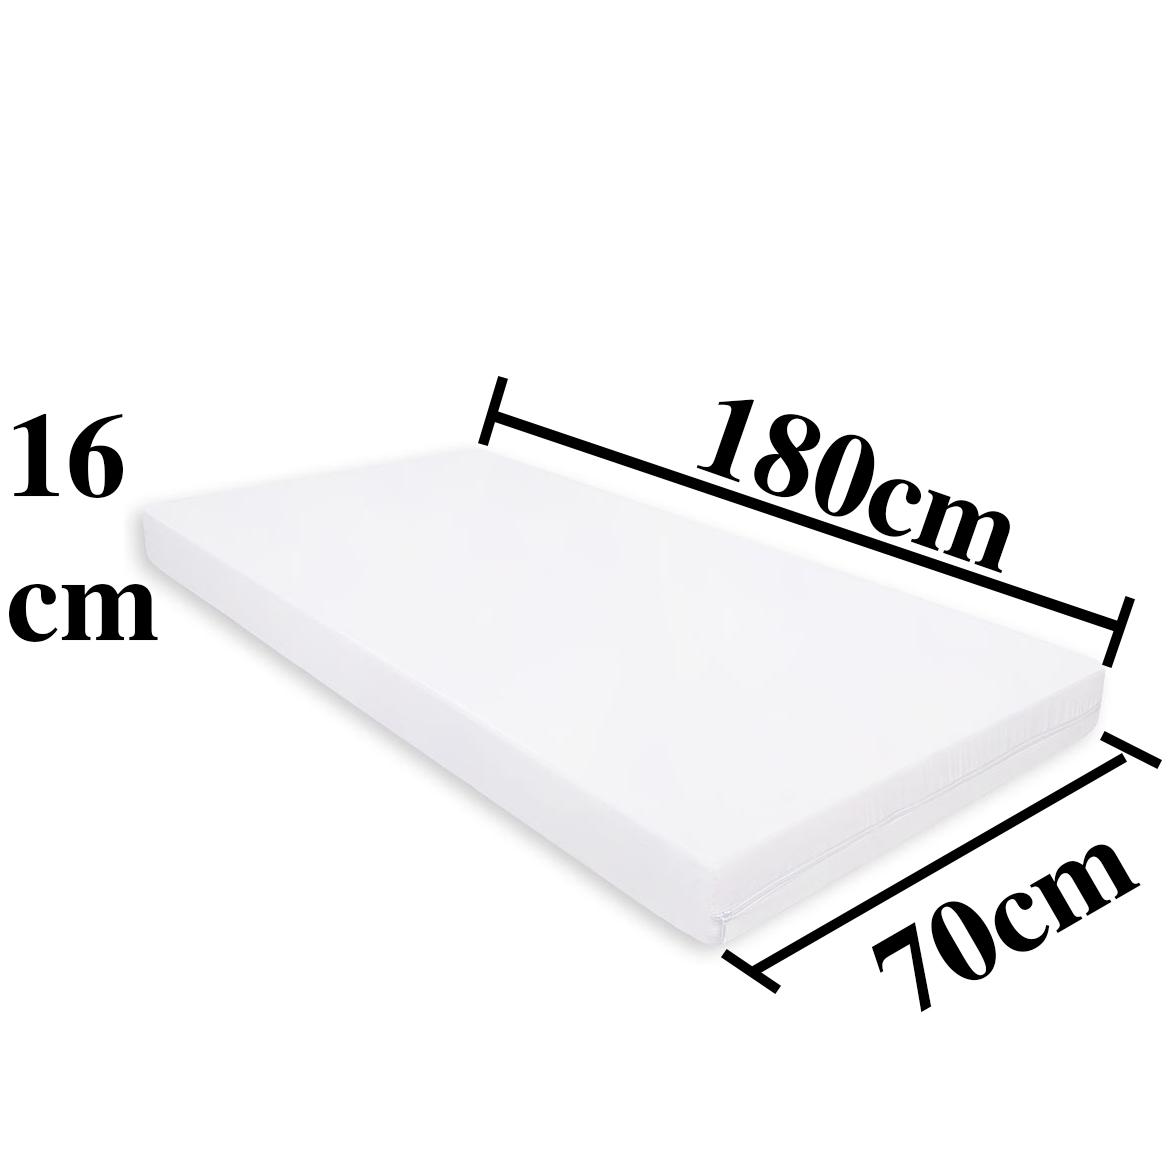 Matratze 70x180x16cm 80x190x16cm 90x190x16cm Kaltschaum – Bild 2